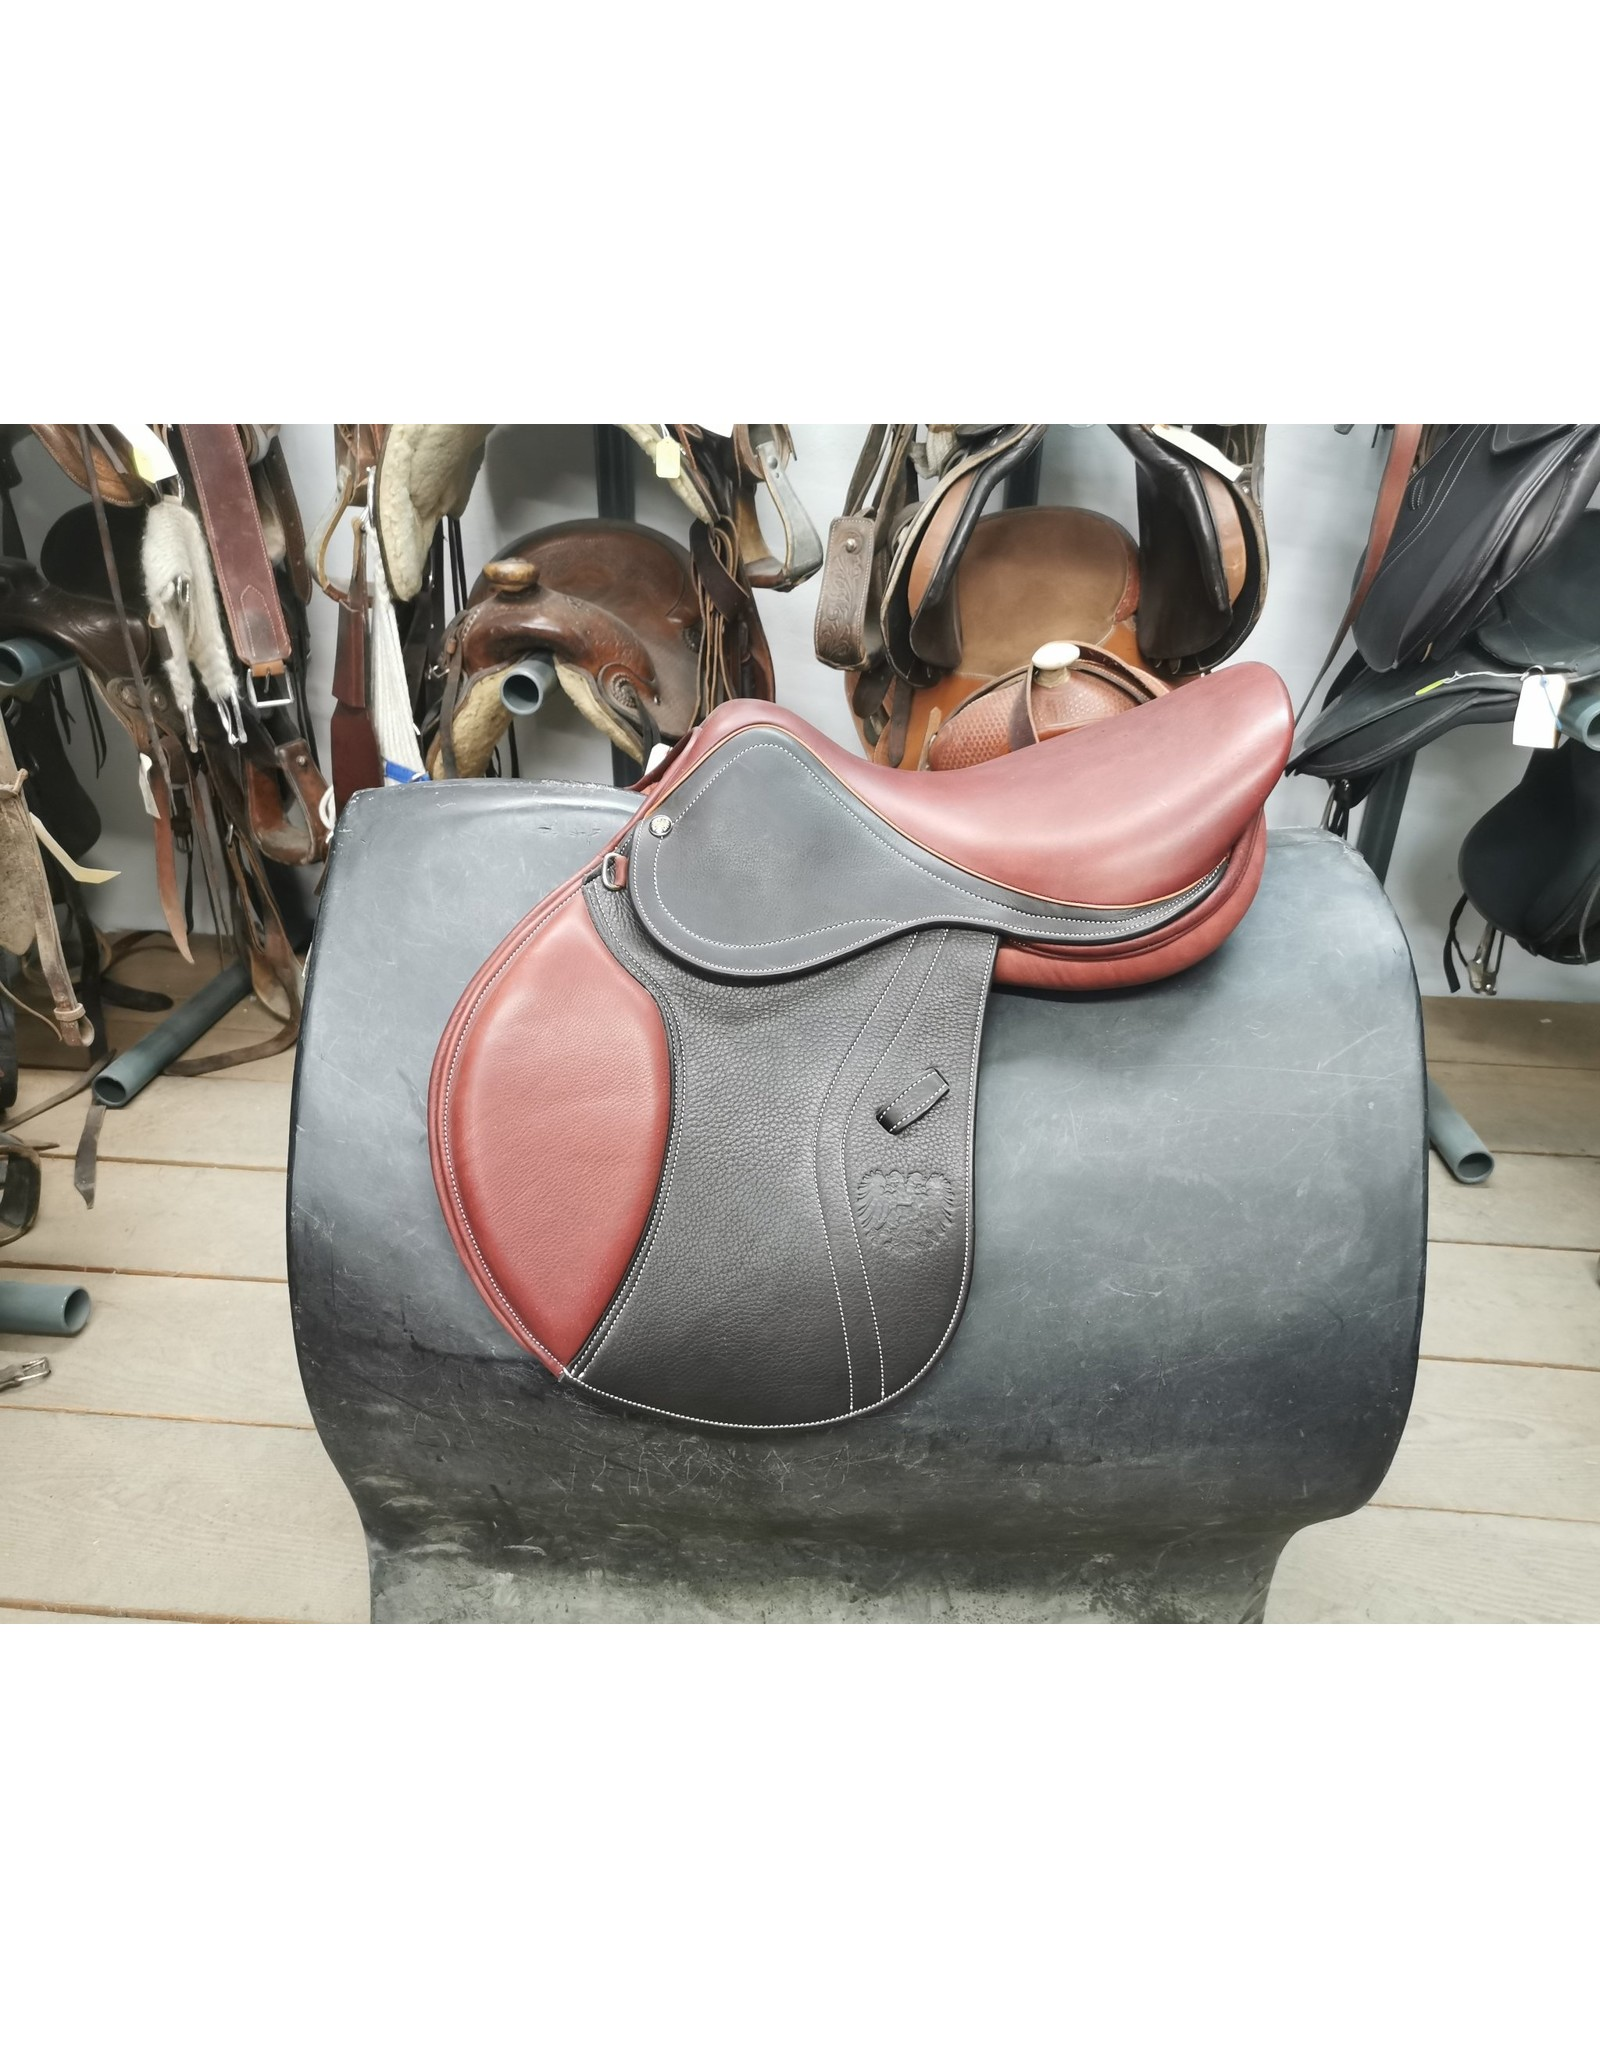 "17"" JA Saddlery Close Contact Saddle"